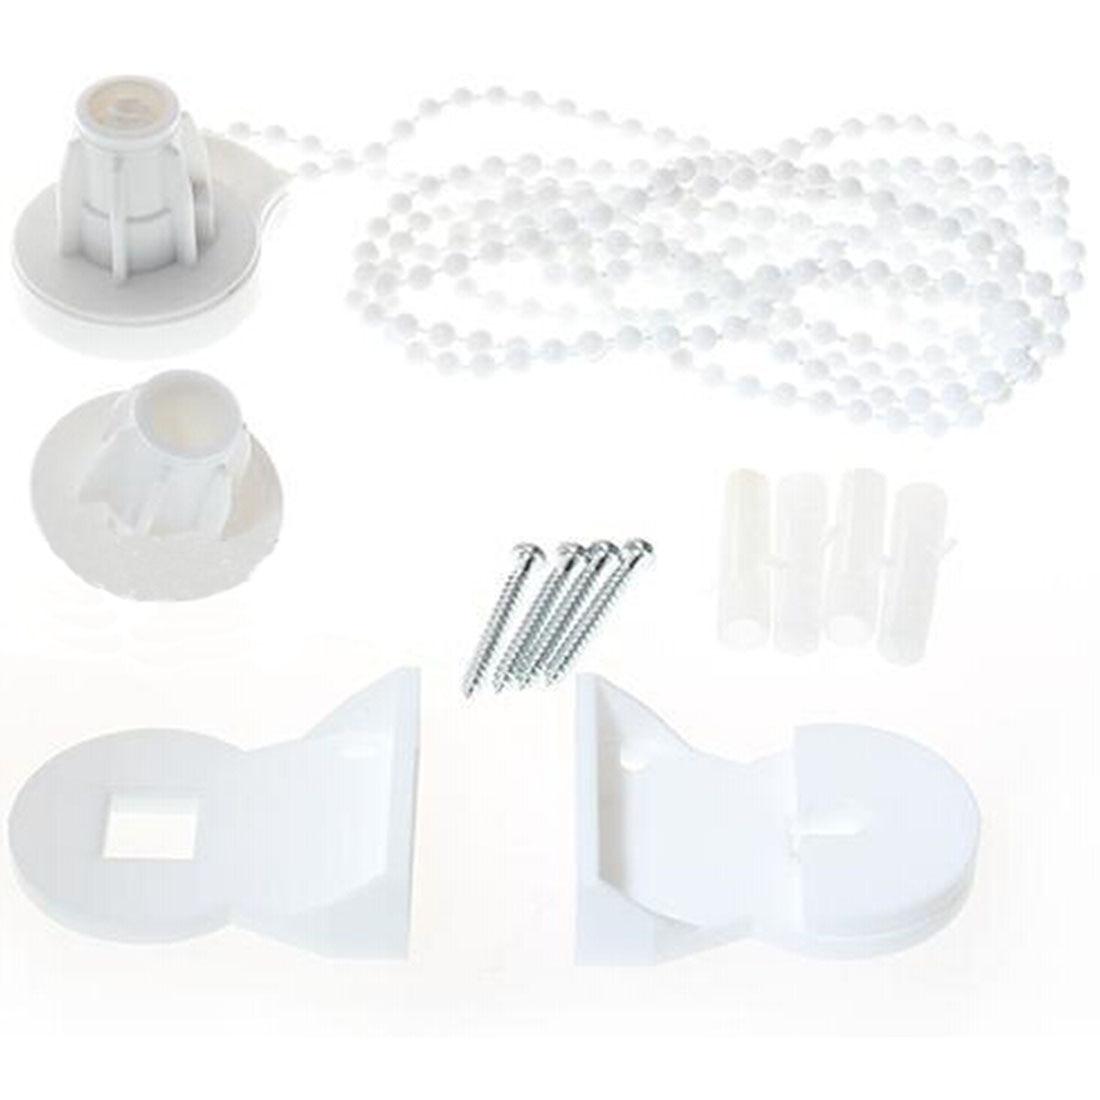 Populair Merk Witte Vlakte Beknopte Gordijn Rolluiken Roller Blind Pom Accessoires Hoge Kwaliteit Acessorios Para Cortina